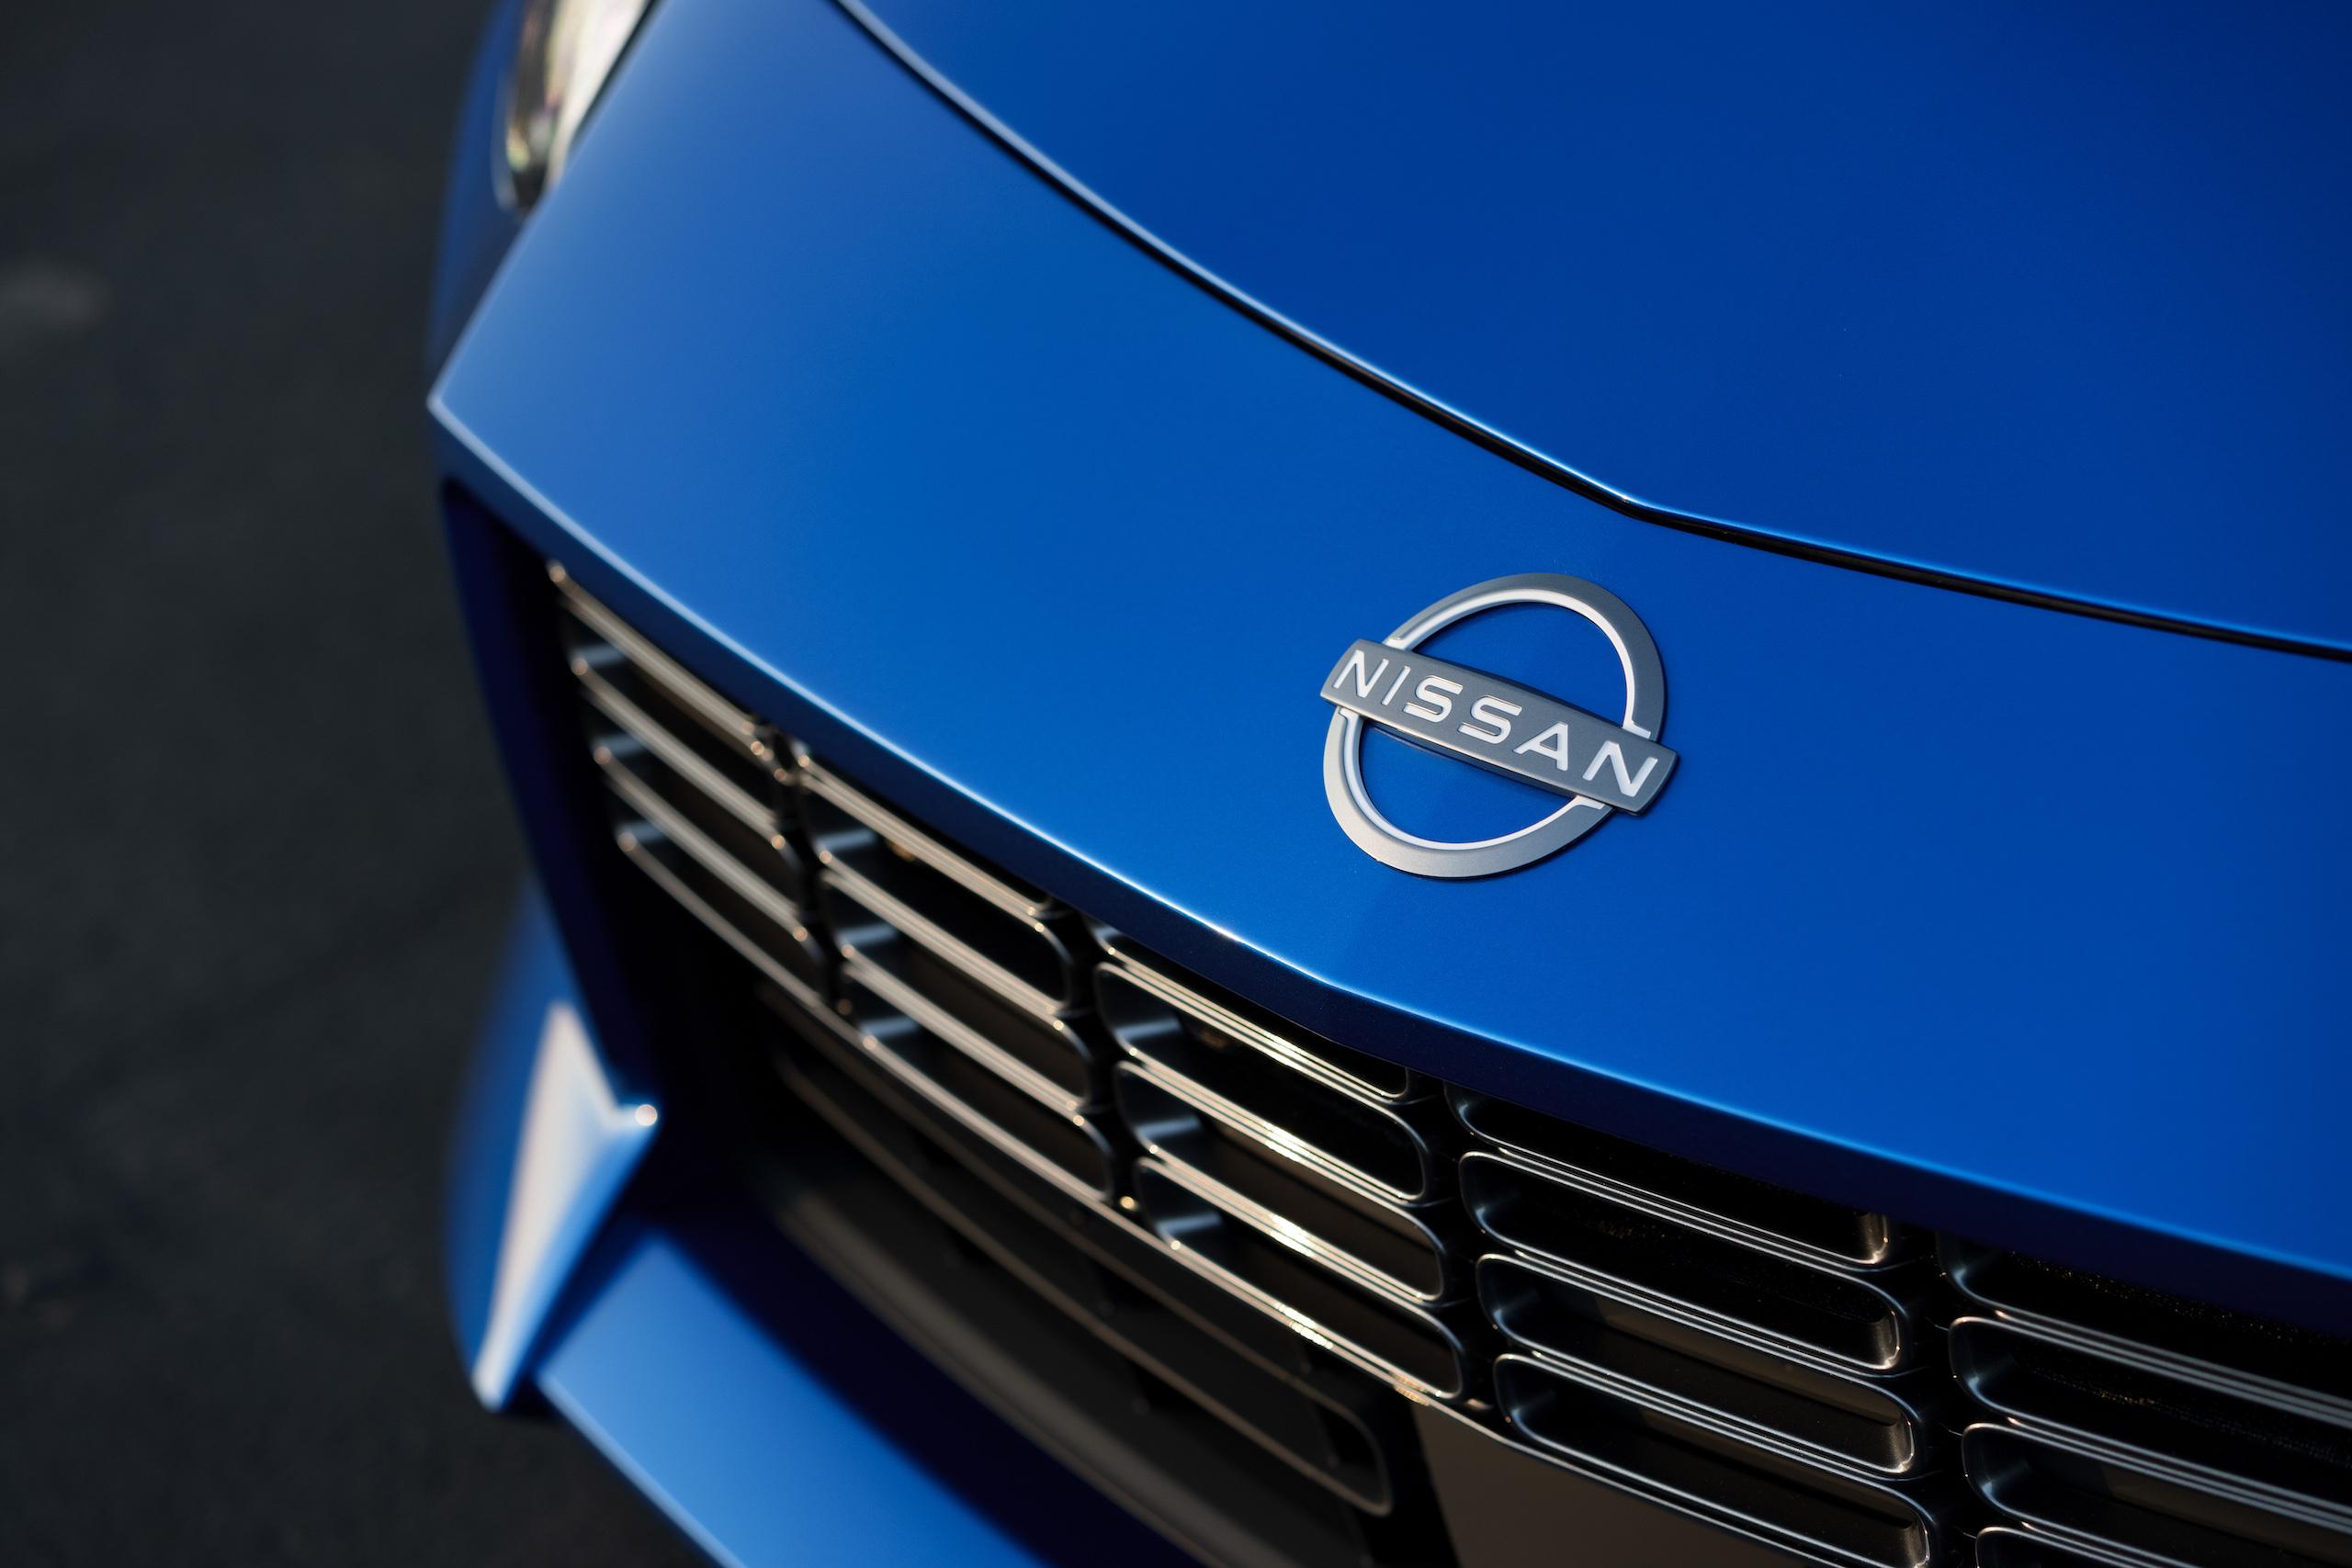 2023 Nissan Z hood badge detail